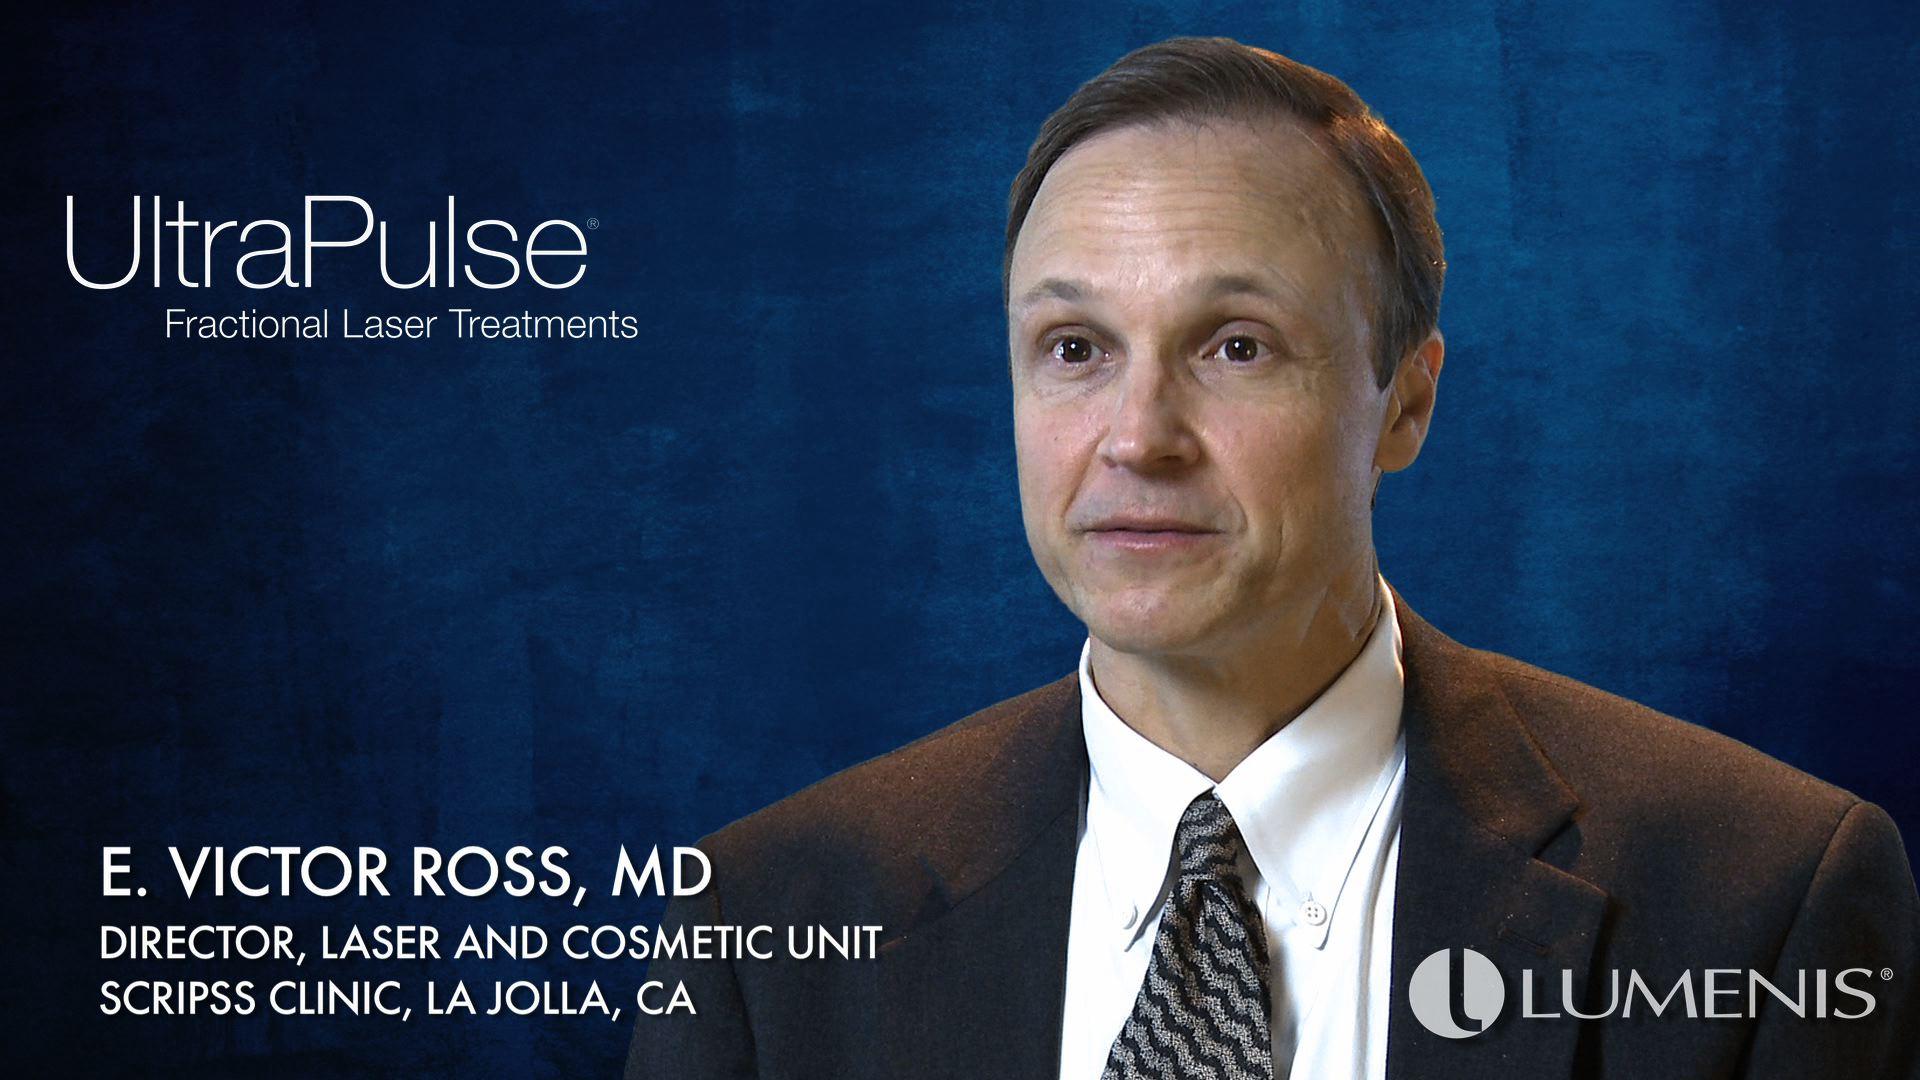 E. Victor Ross, MD on UltraPulse Fractional Laser Treatments